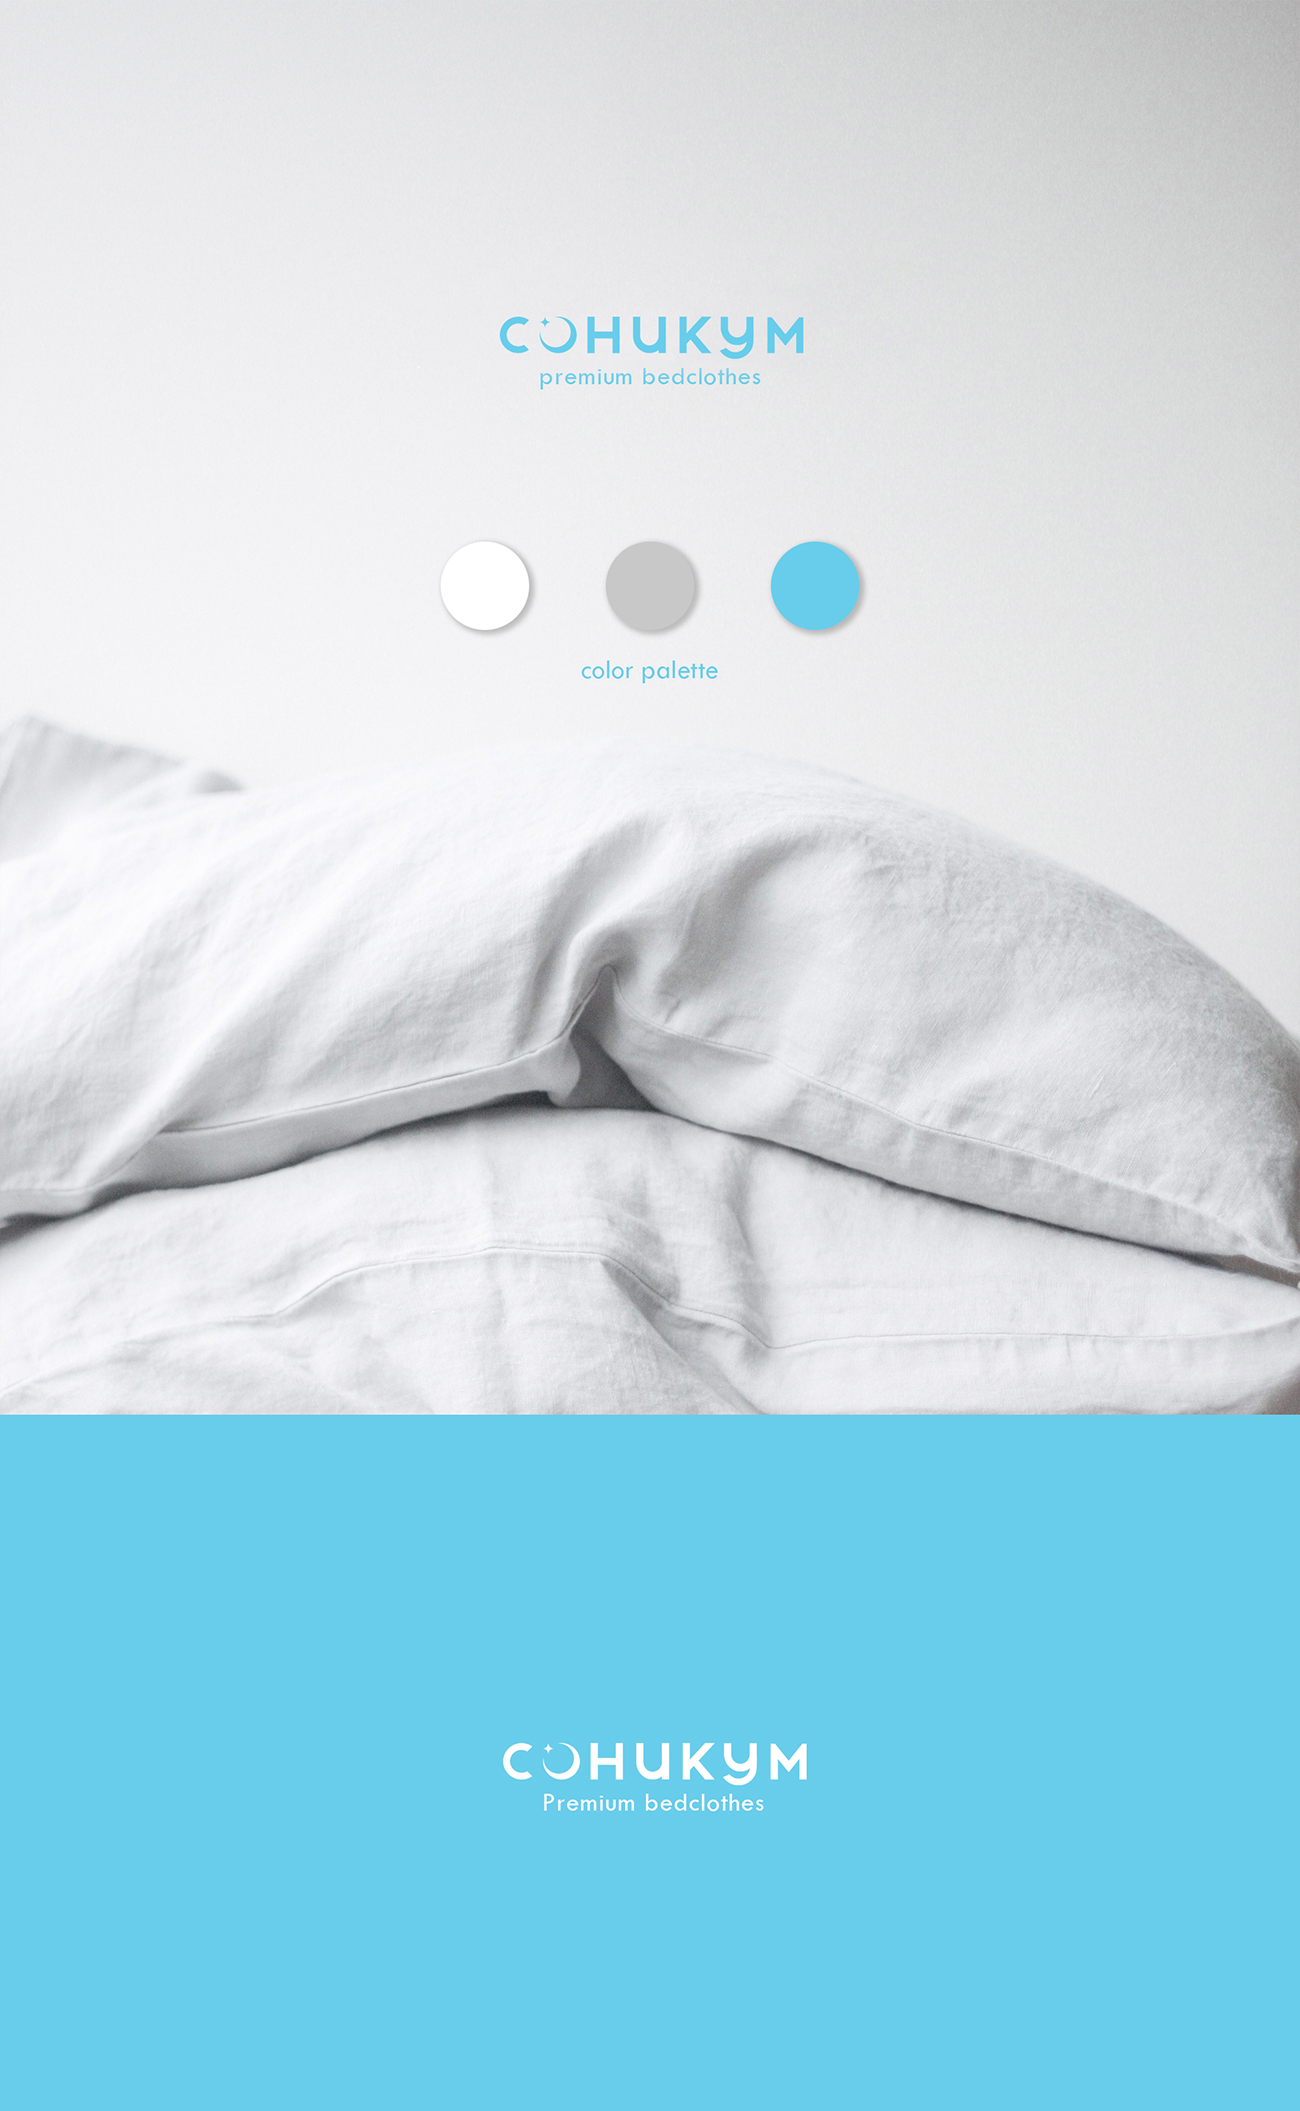 Логотип бренда производителя подушек и одеял (Конкурс - 1 место)